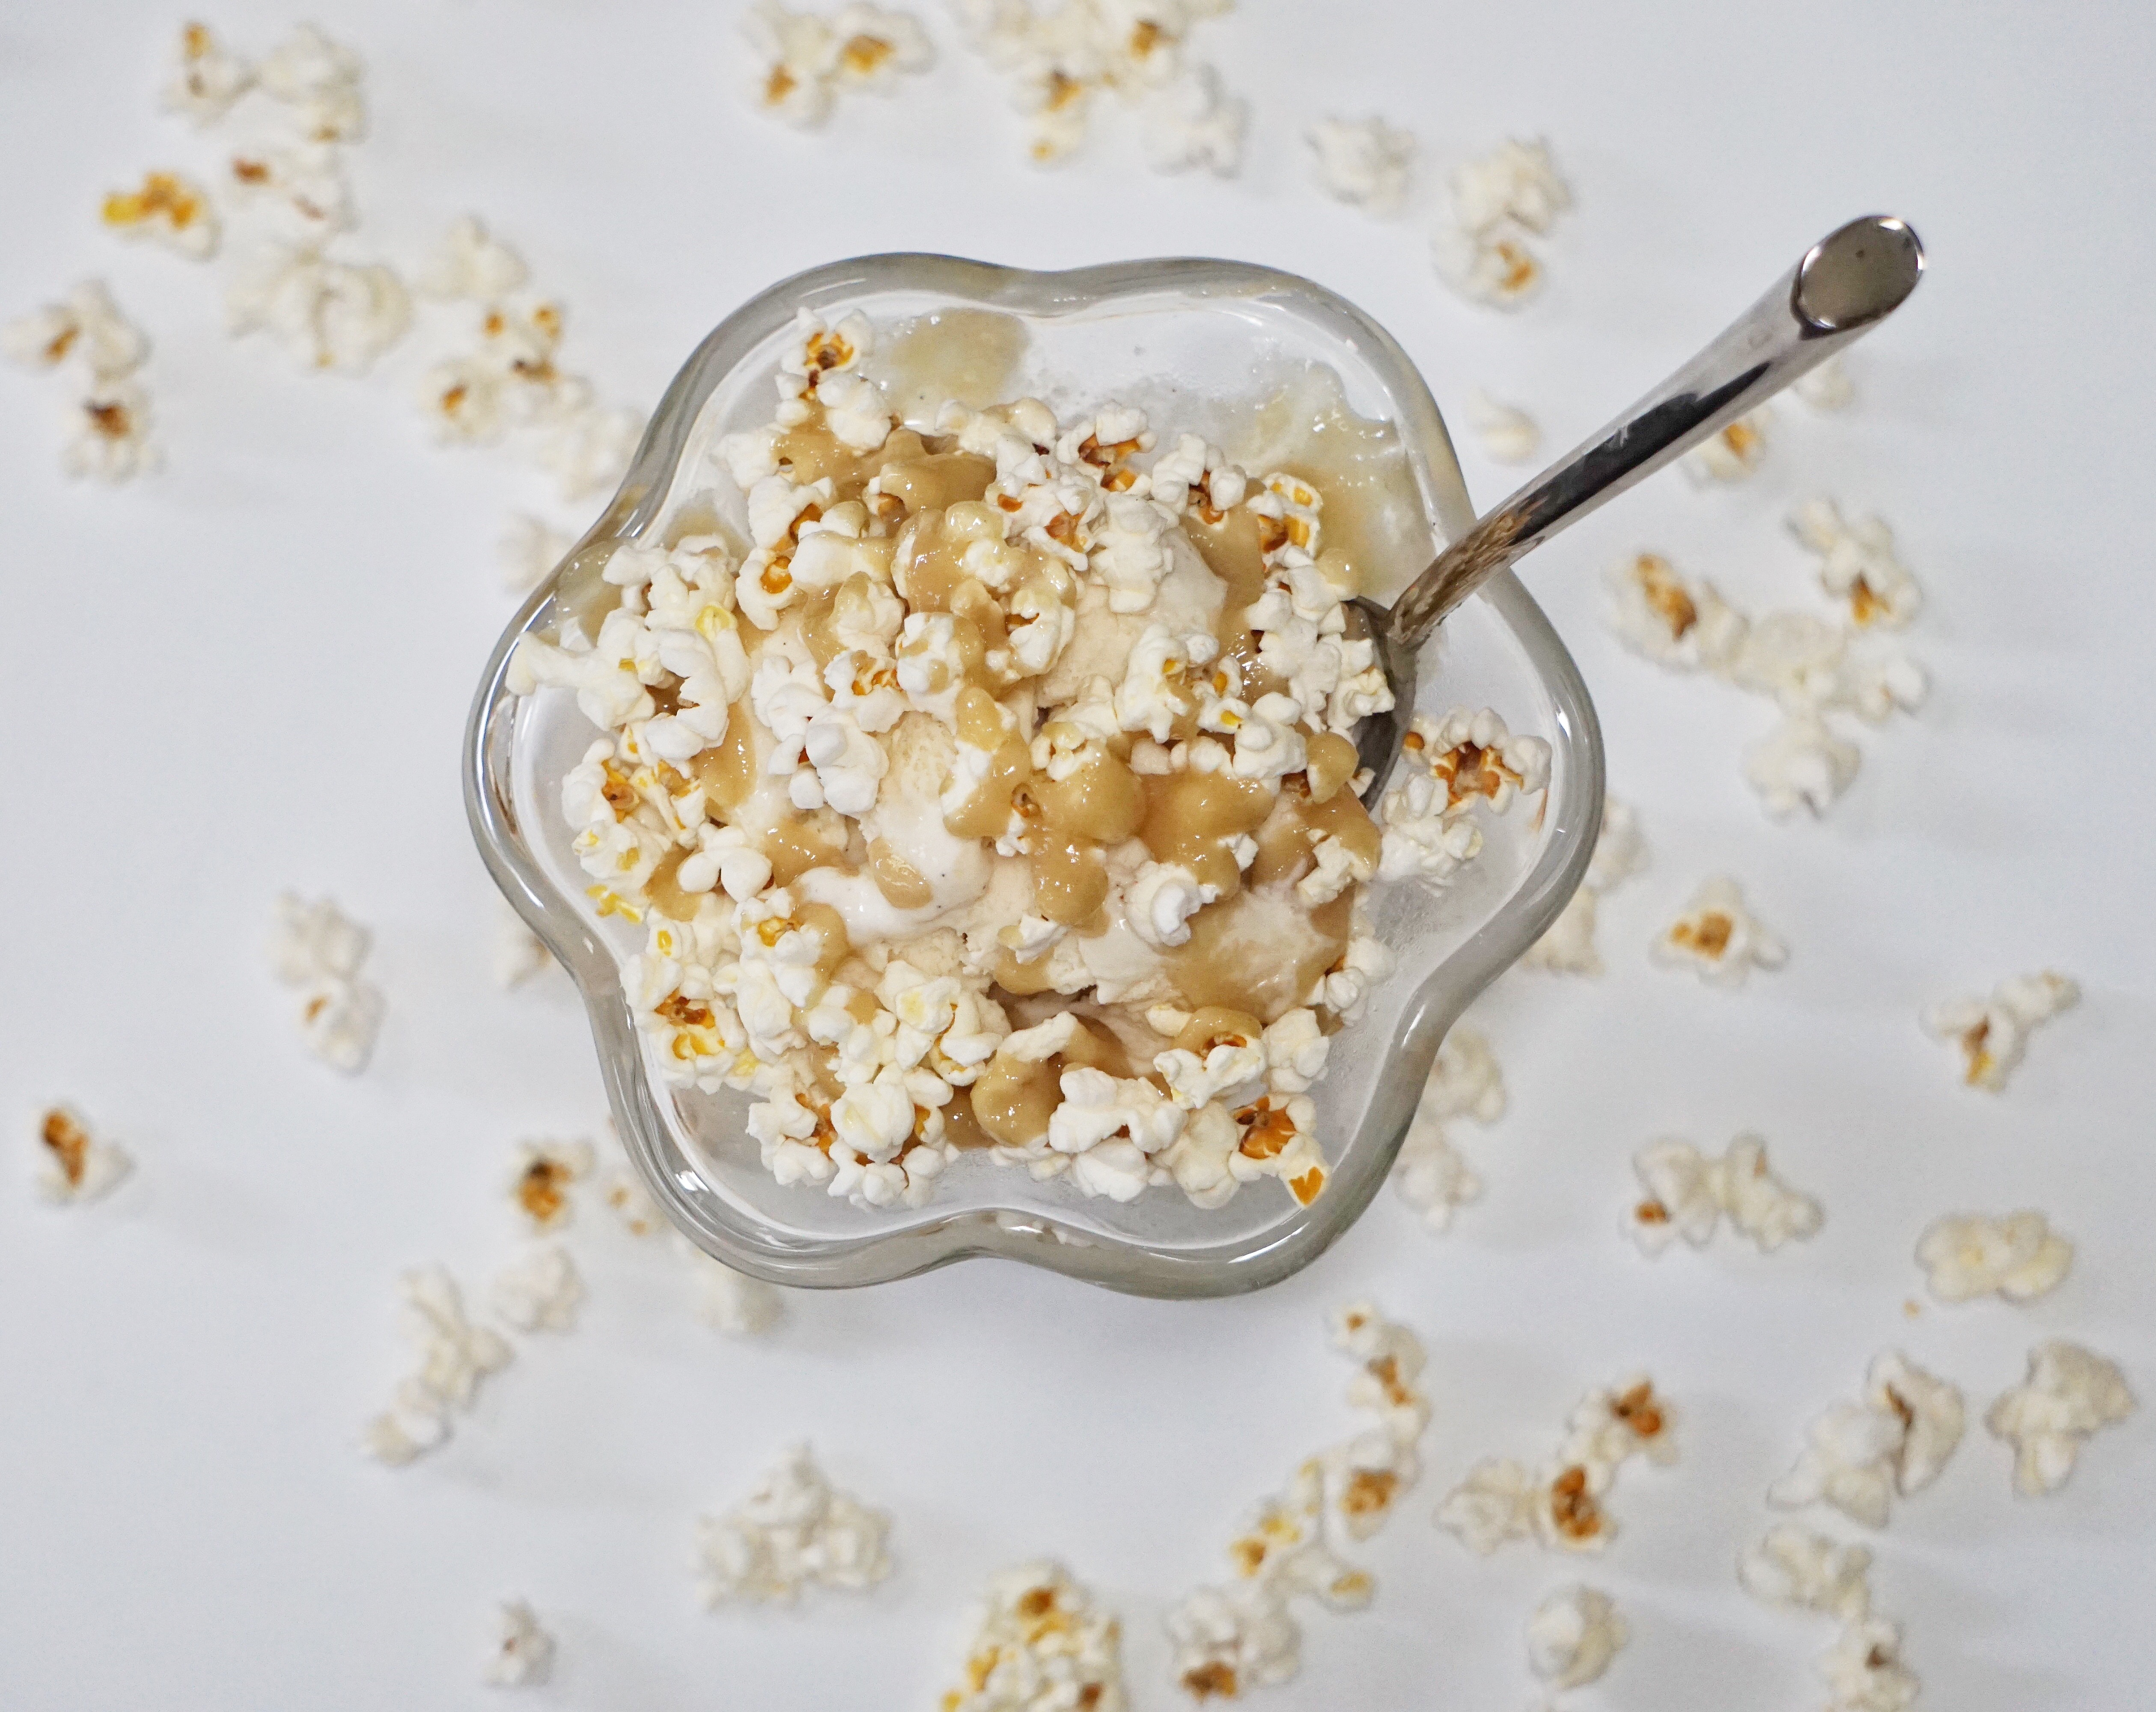 Sea Salt Popcorn Sundae 3 - Sea Salt Popcorn Sundae